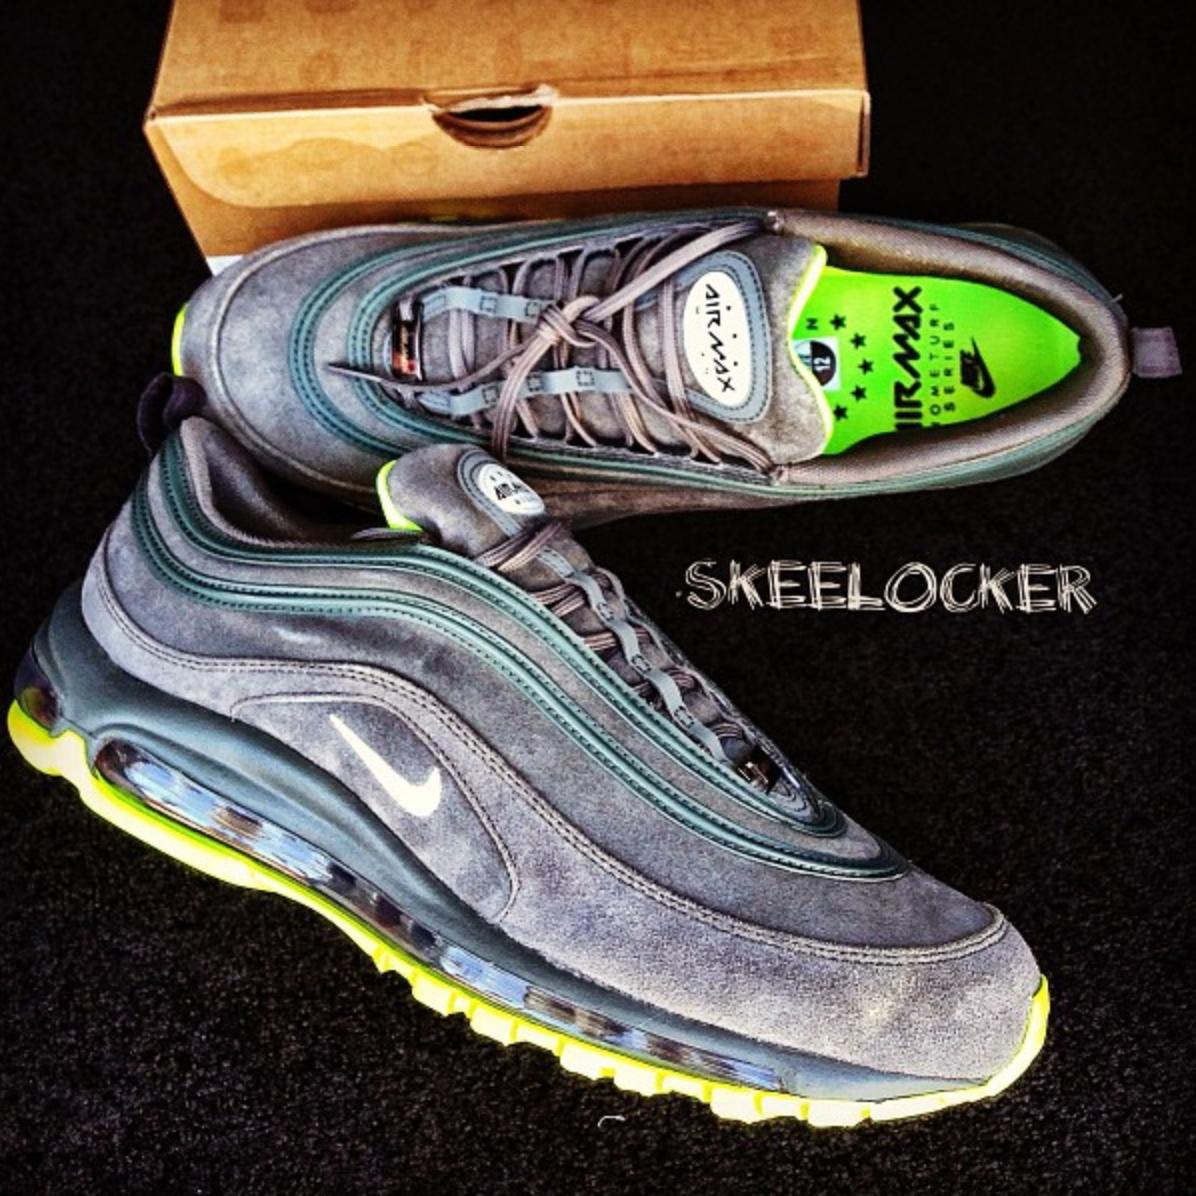 Skeelocker 108 365 Air Max 97 Milan Qs From The Euro Hometurf Pack Amazing Quality W Suede All Arou Hoka Running Shoes Air Max 97 Running Shoes